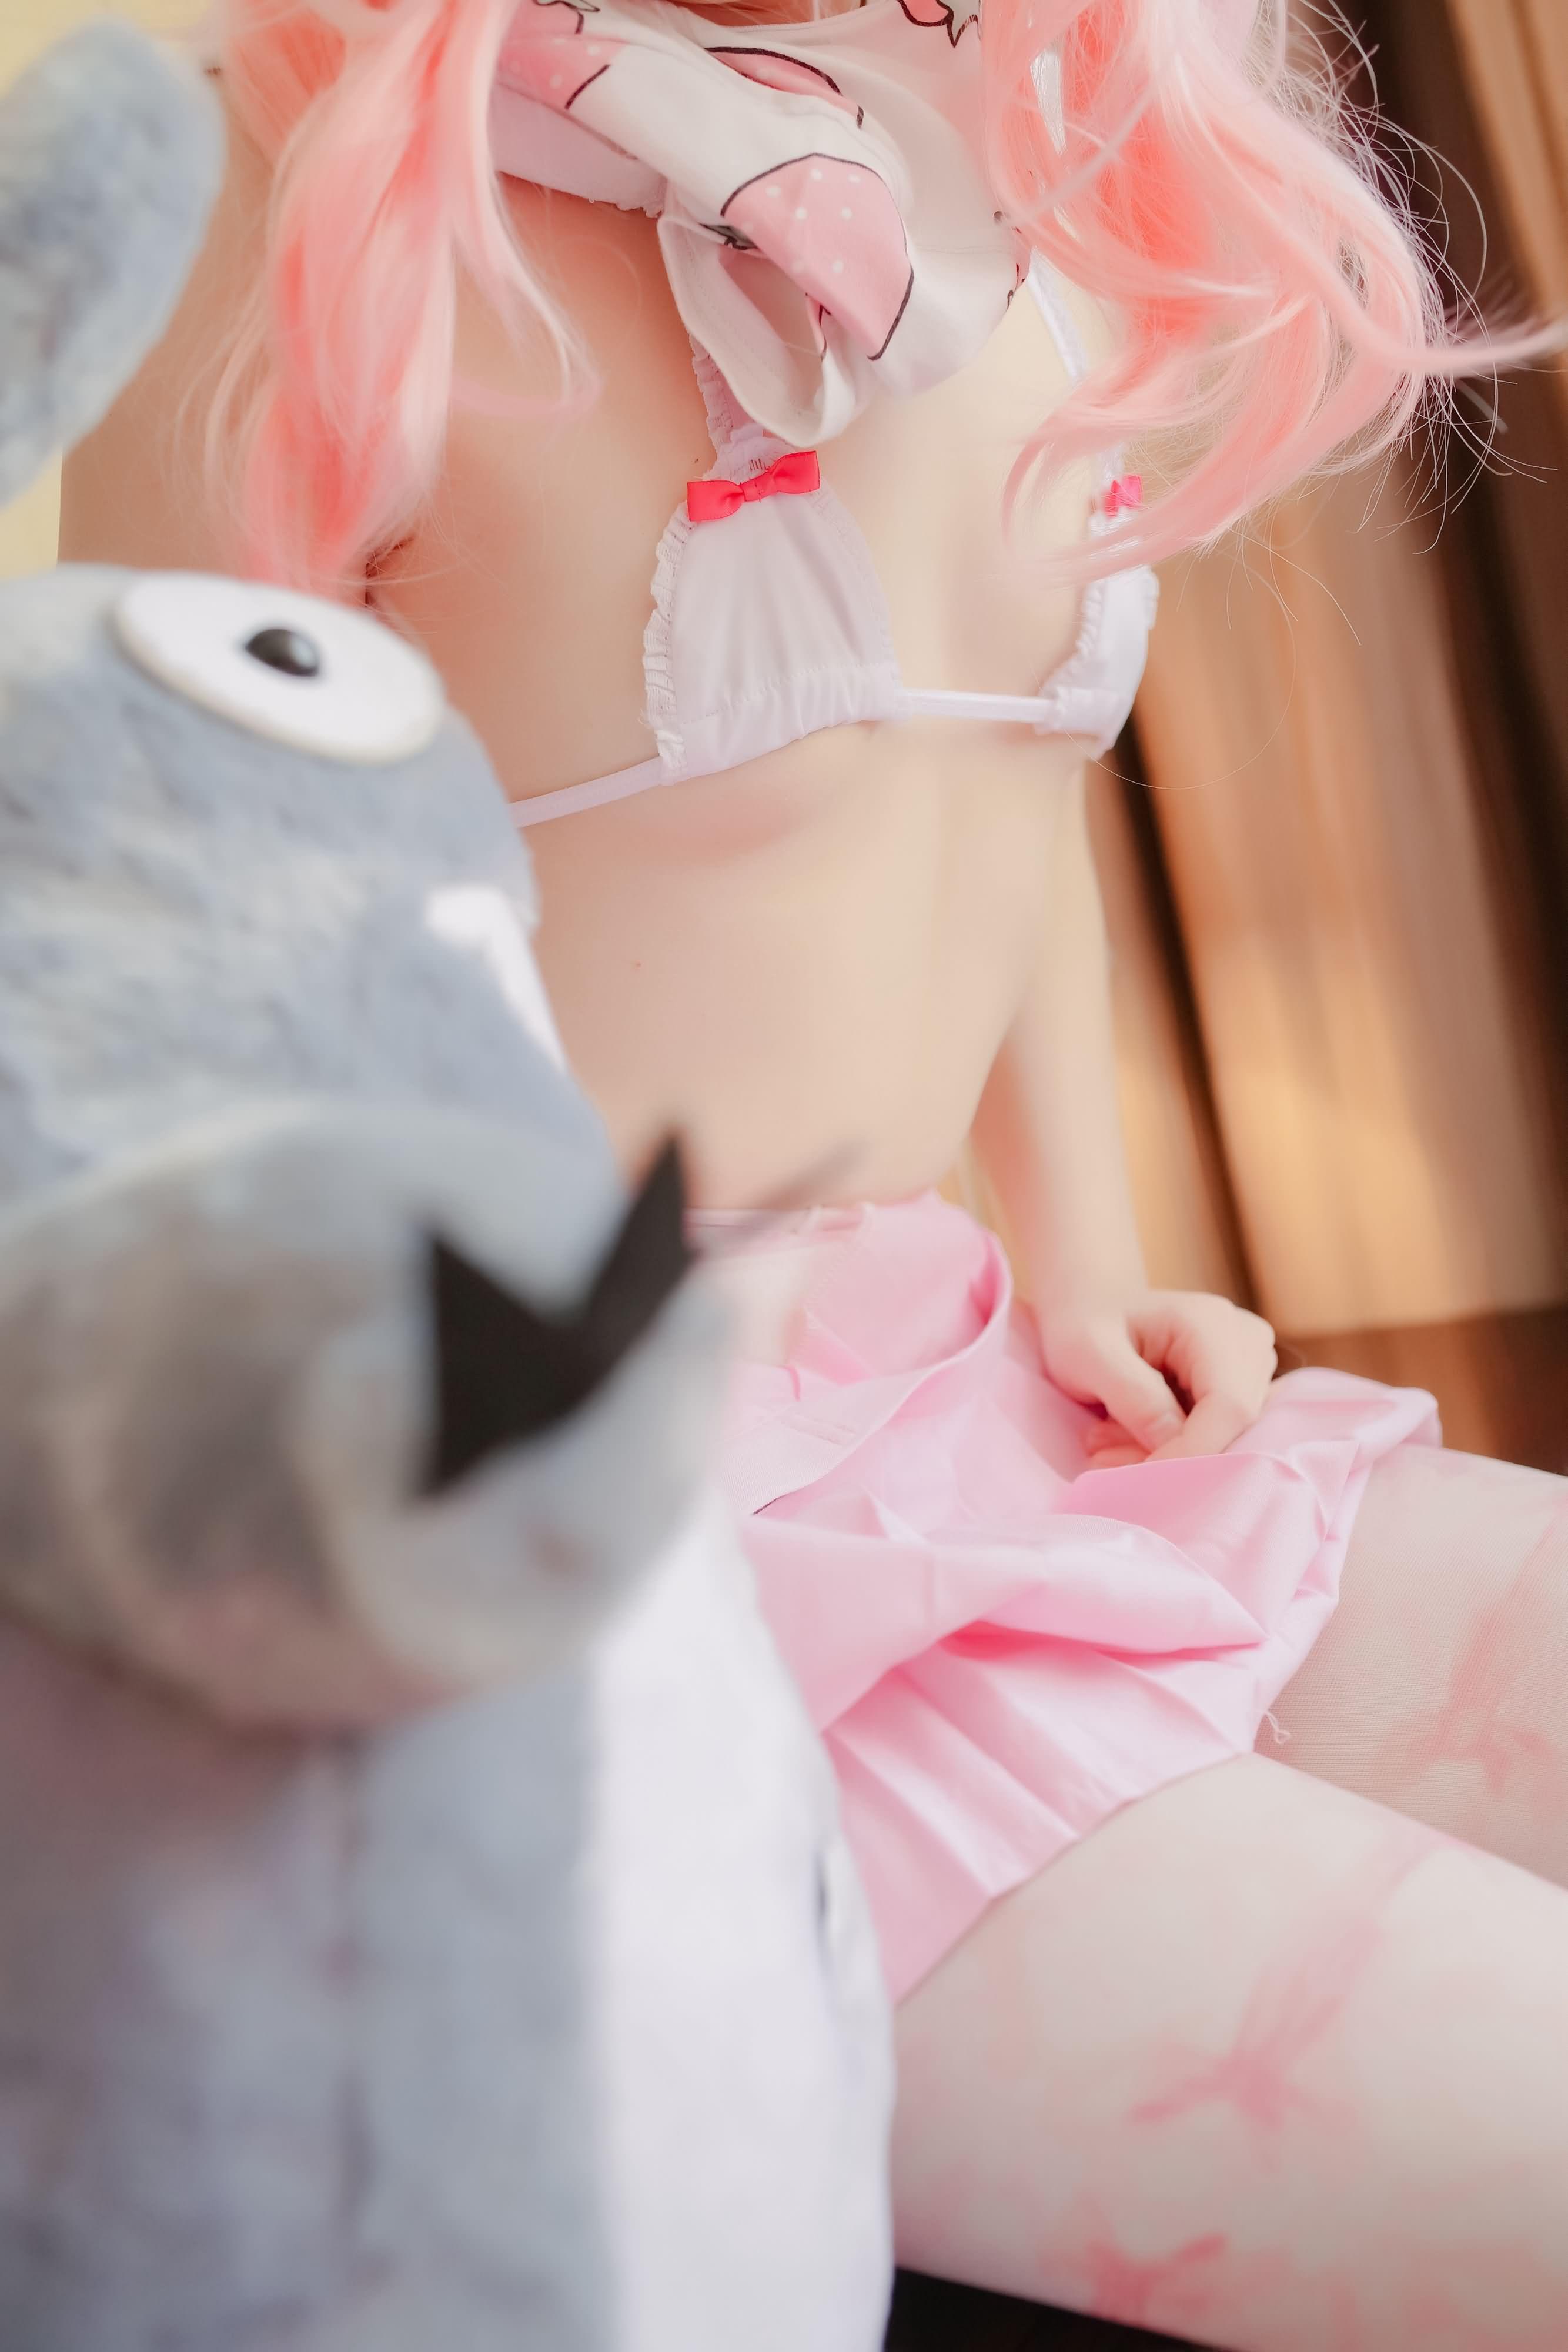 ILkVvo - 【The Girl Theater】 少女映画 Cosplay 龙猫与少女 90P